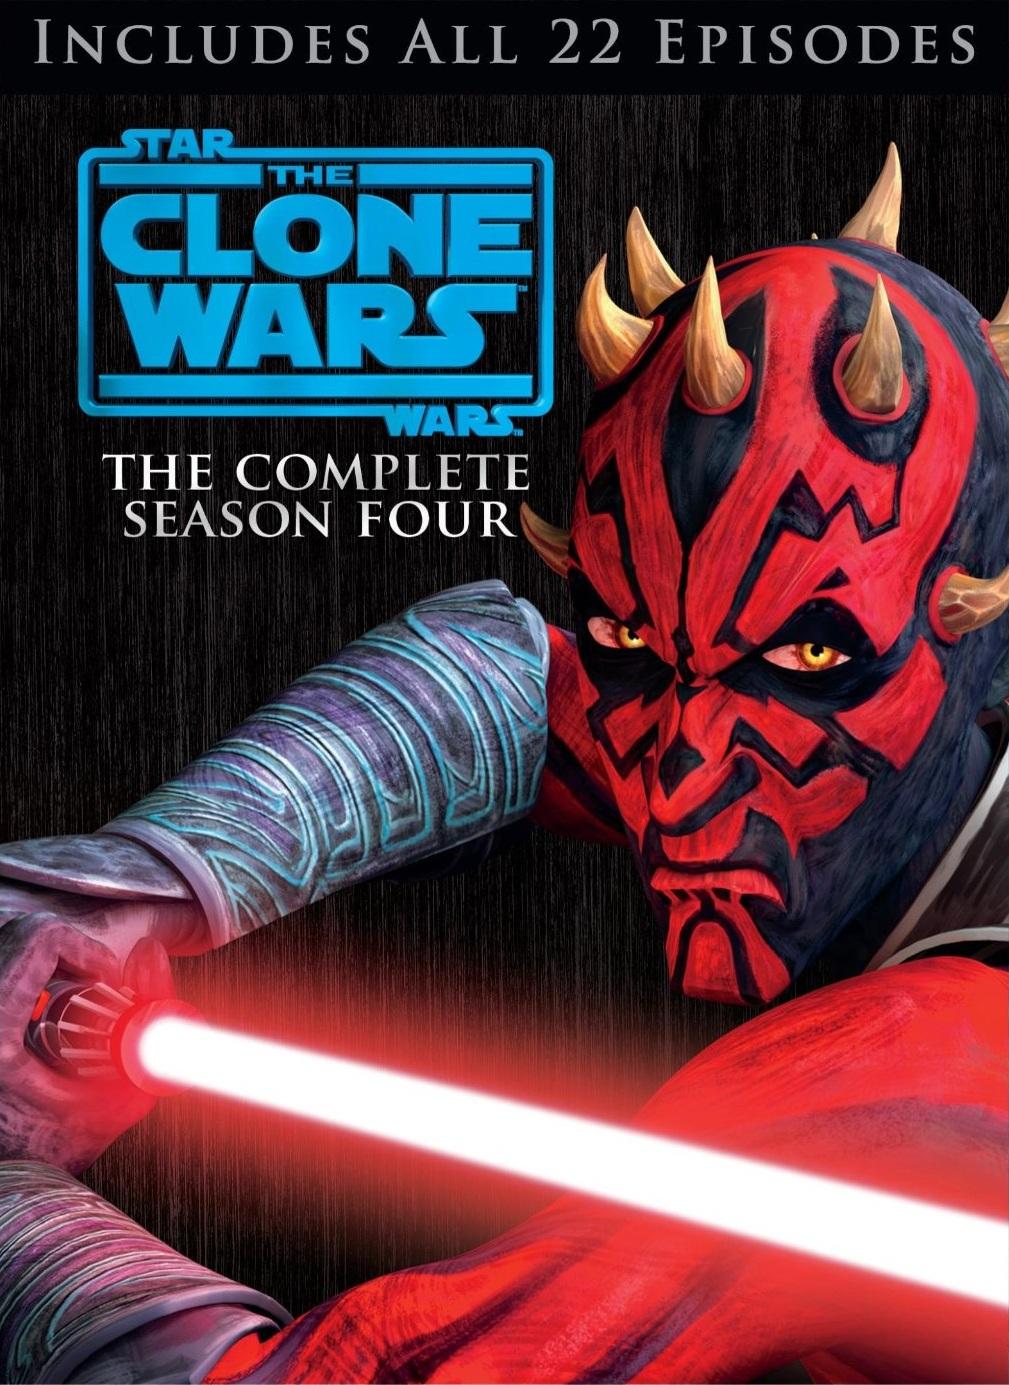 Star Wars The Clones Wars 4 สตาร์ วอร์ส เดอะ โคลน วอร์ส ภาค4 พากย์ไทย